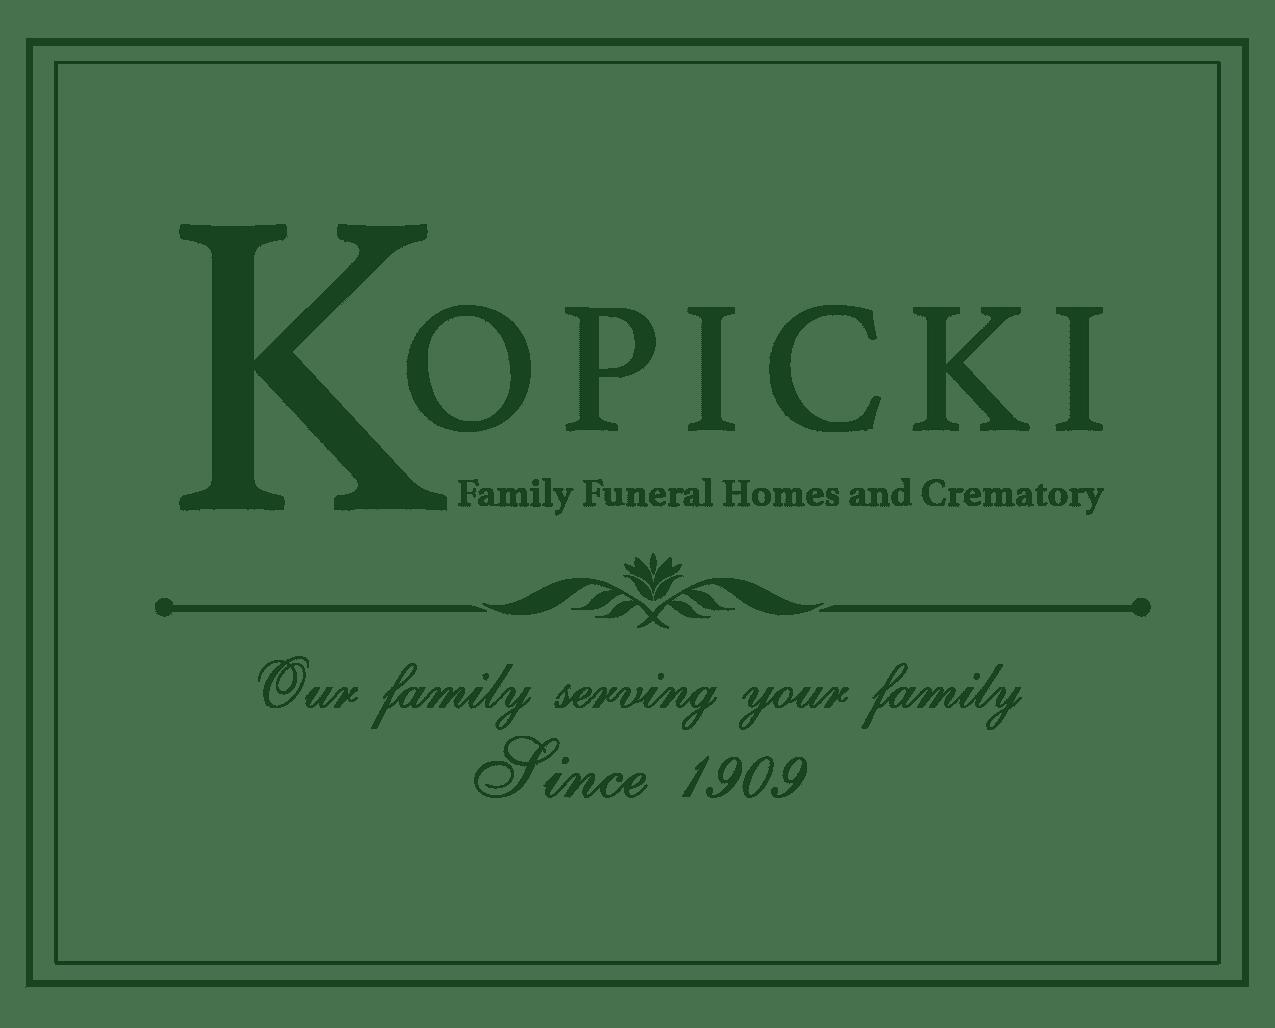 kopicki-logo-NEW-w1275.png